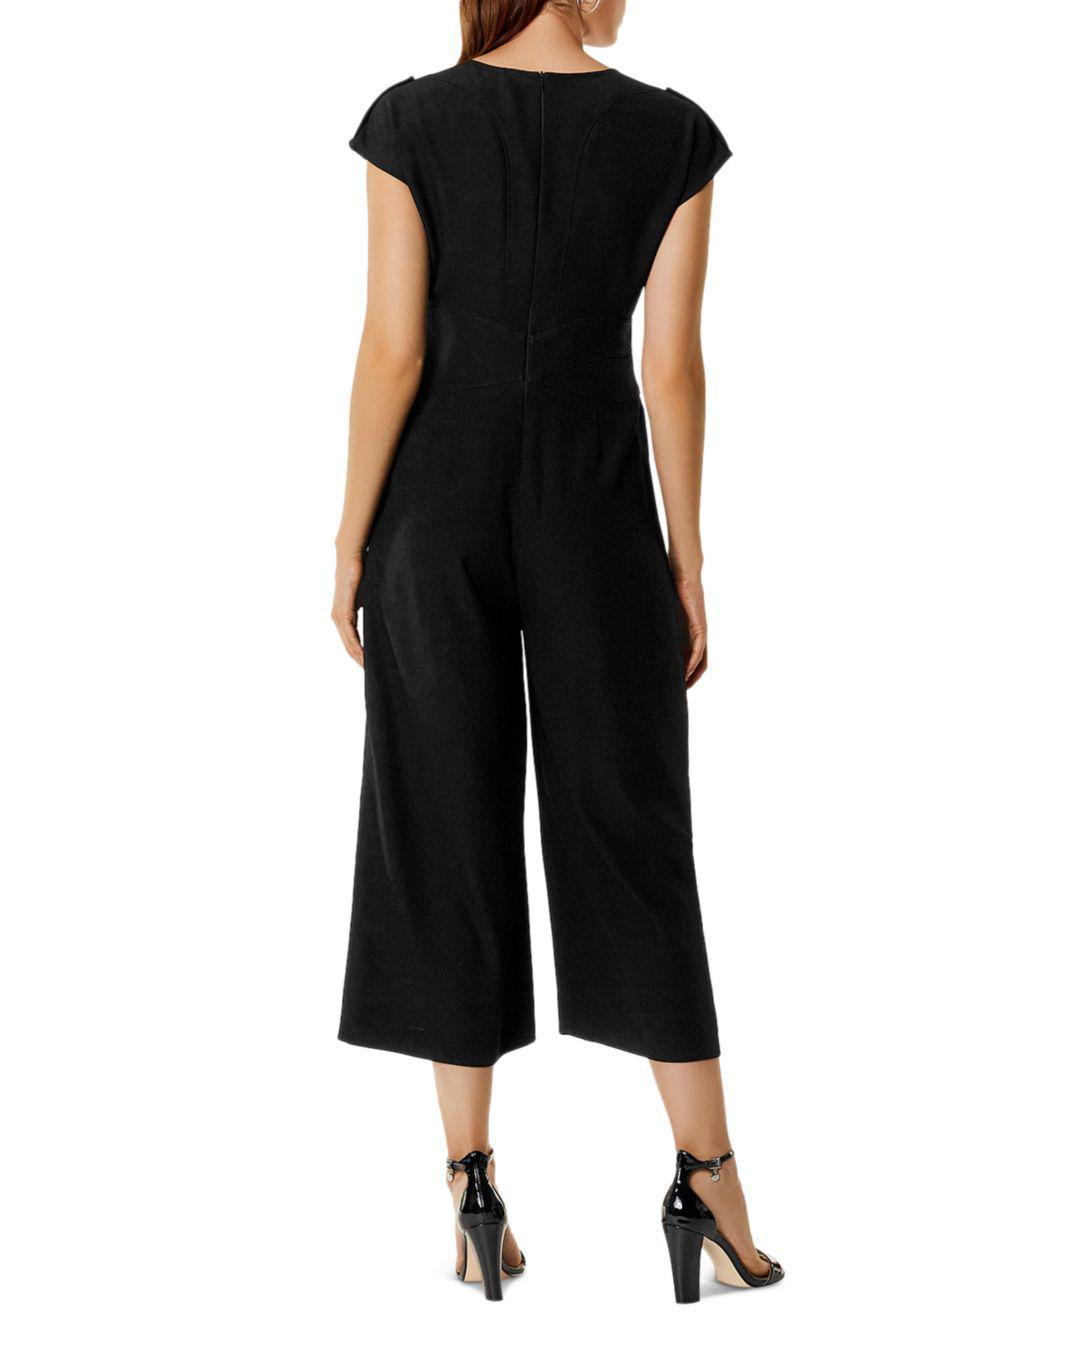 425081b73b5 Lyst - Karen Millen Corset Belt Detail Wide-leg Jumpsuit in Black